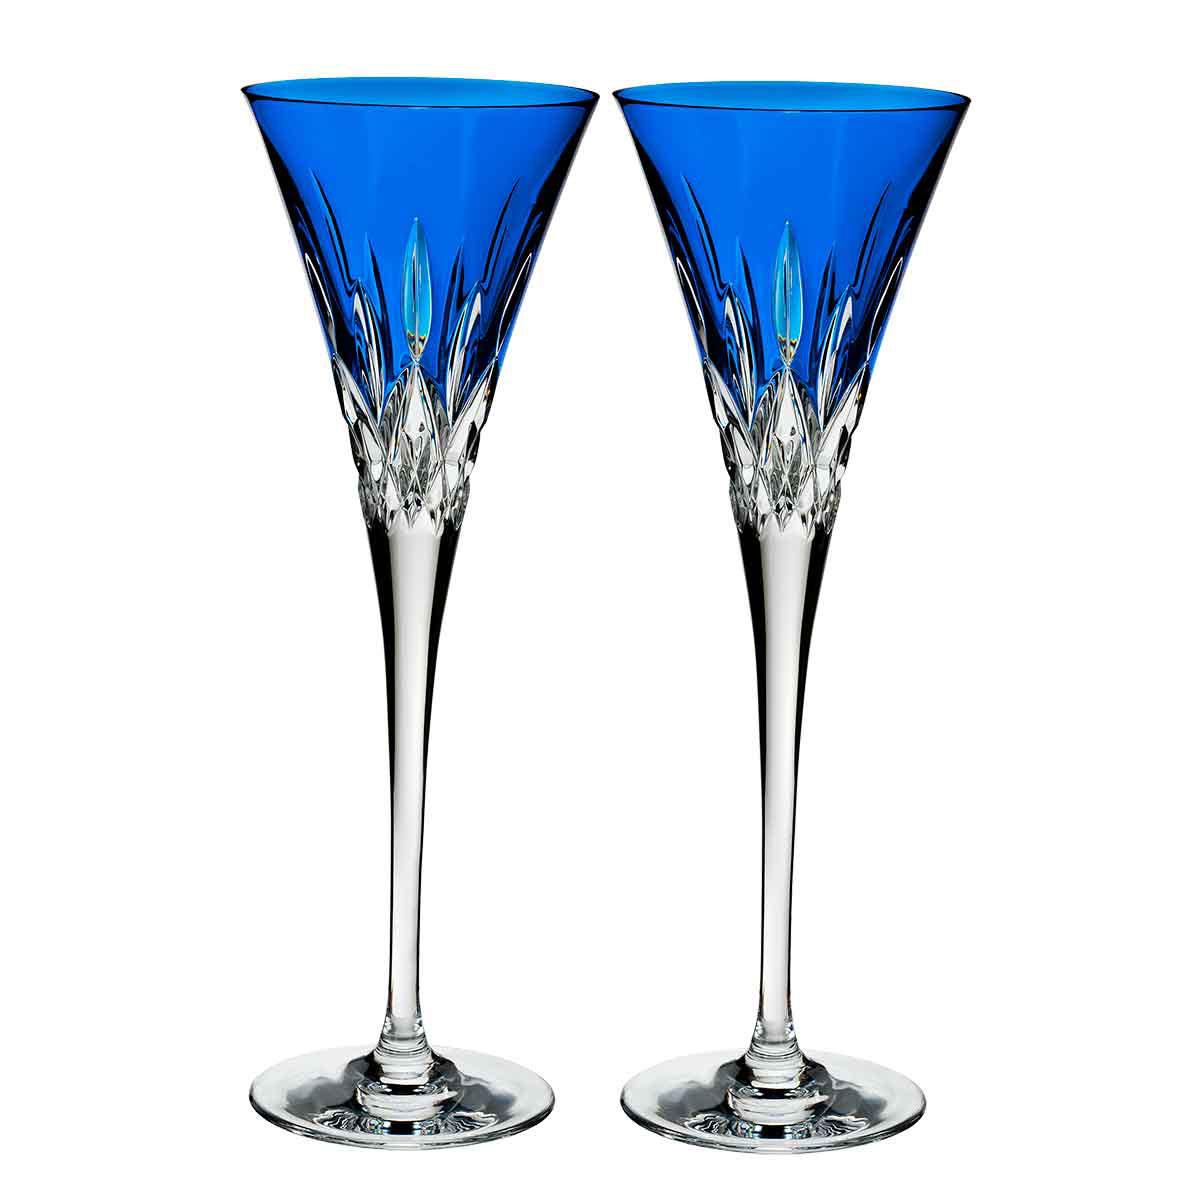 Waterford Crystal, Lismore Pops Cobalt Toasting Crystal Flutes, Pair